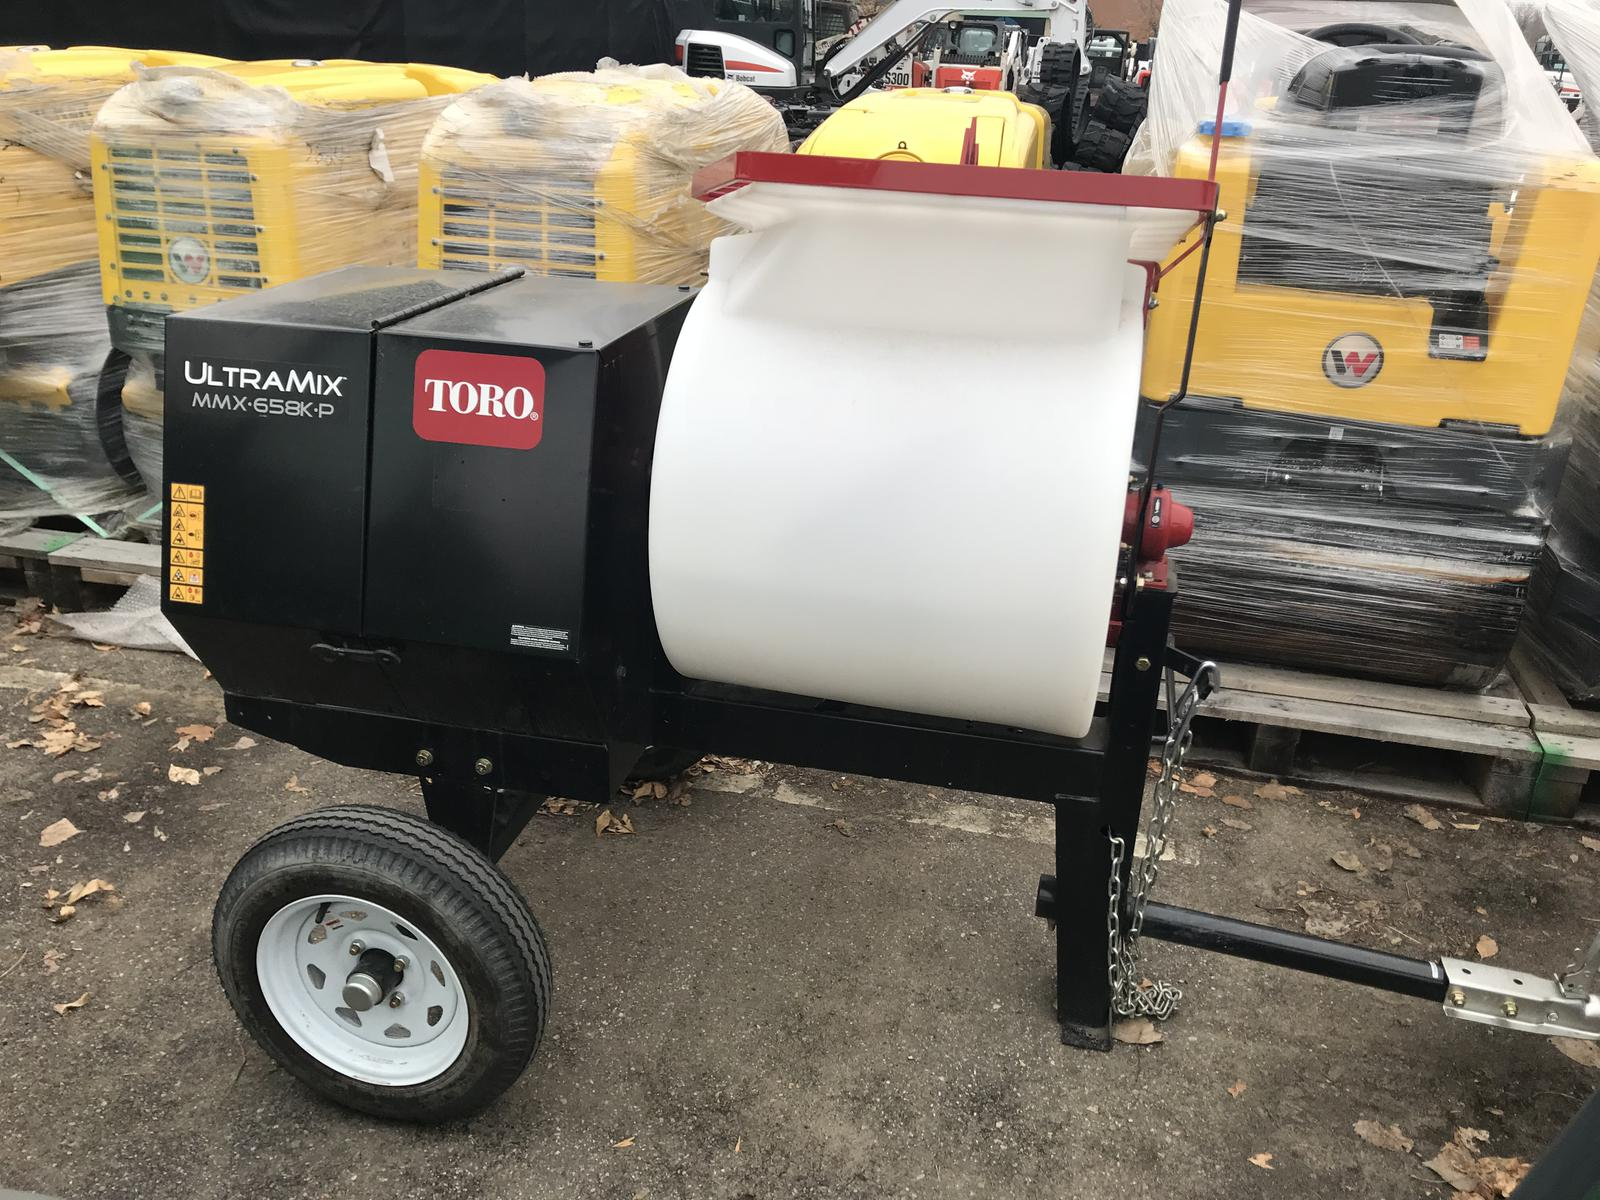 Mortar Mixer For Sale >> Toro Mmx 658k P Ultramix Mortar Mixer For Sale In